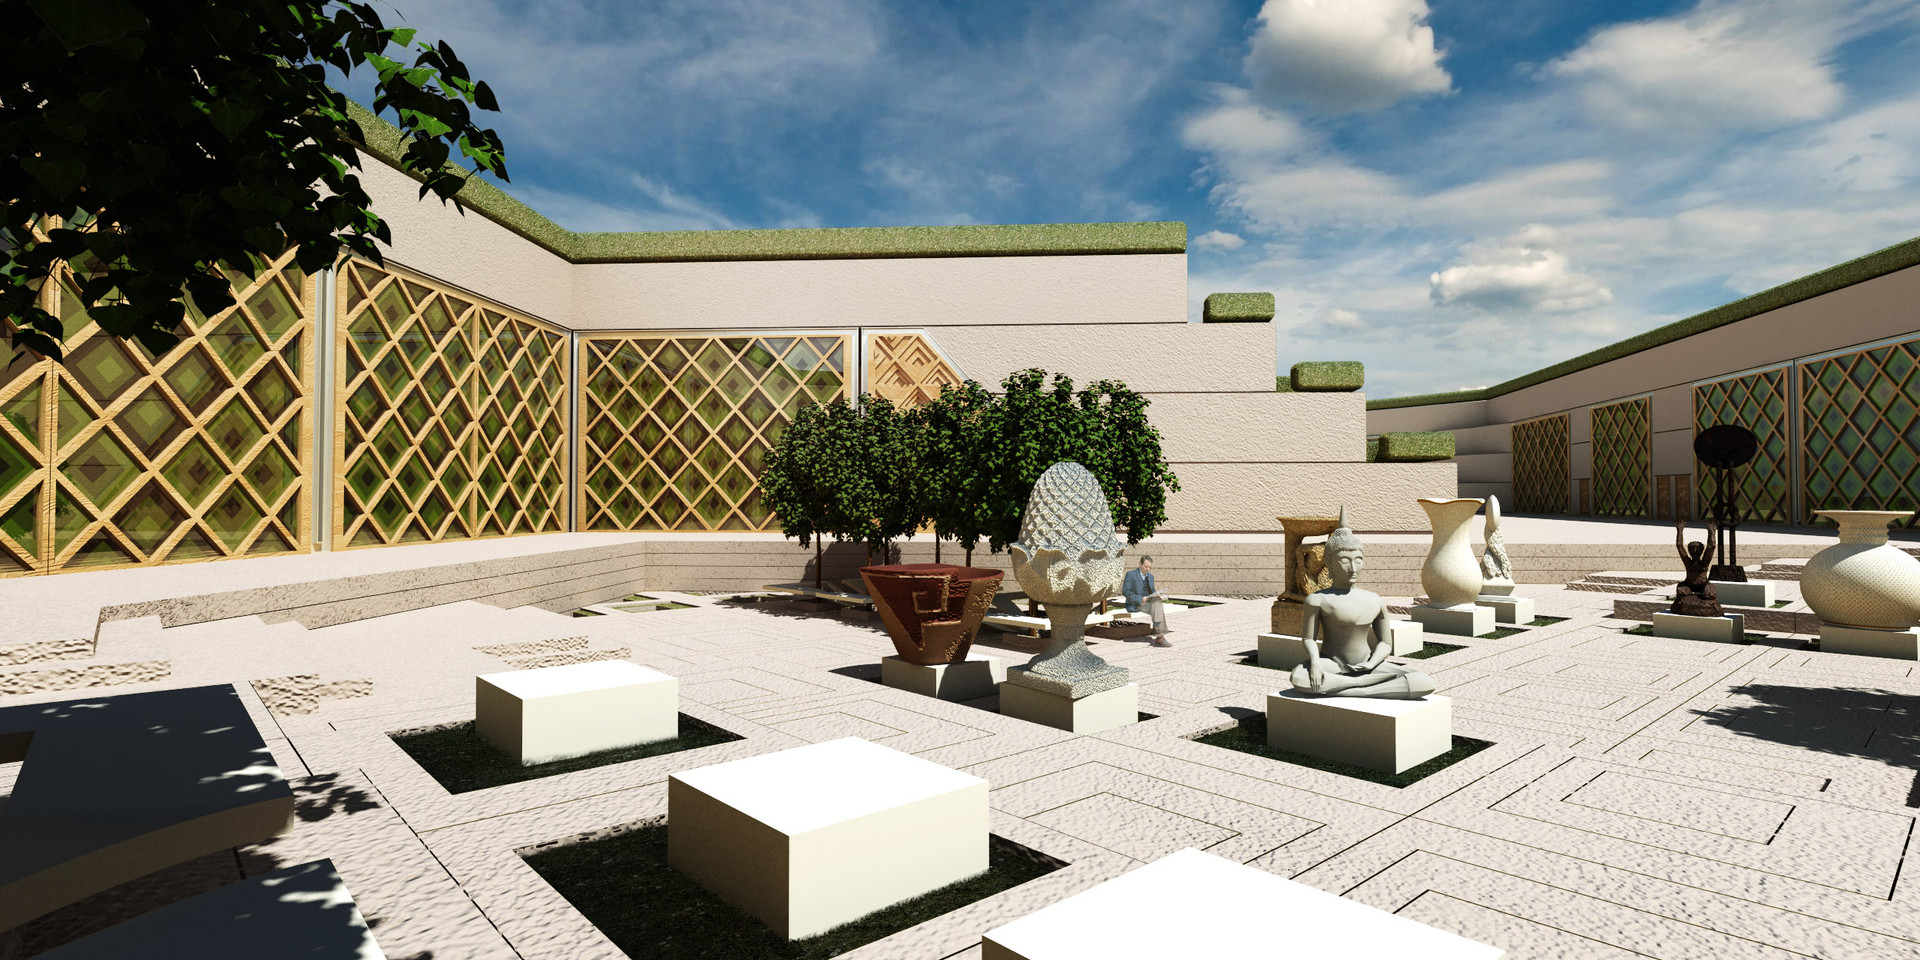 Bamiyan Cultural Center Courtyard Perspective